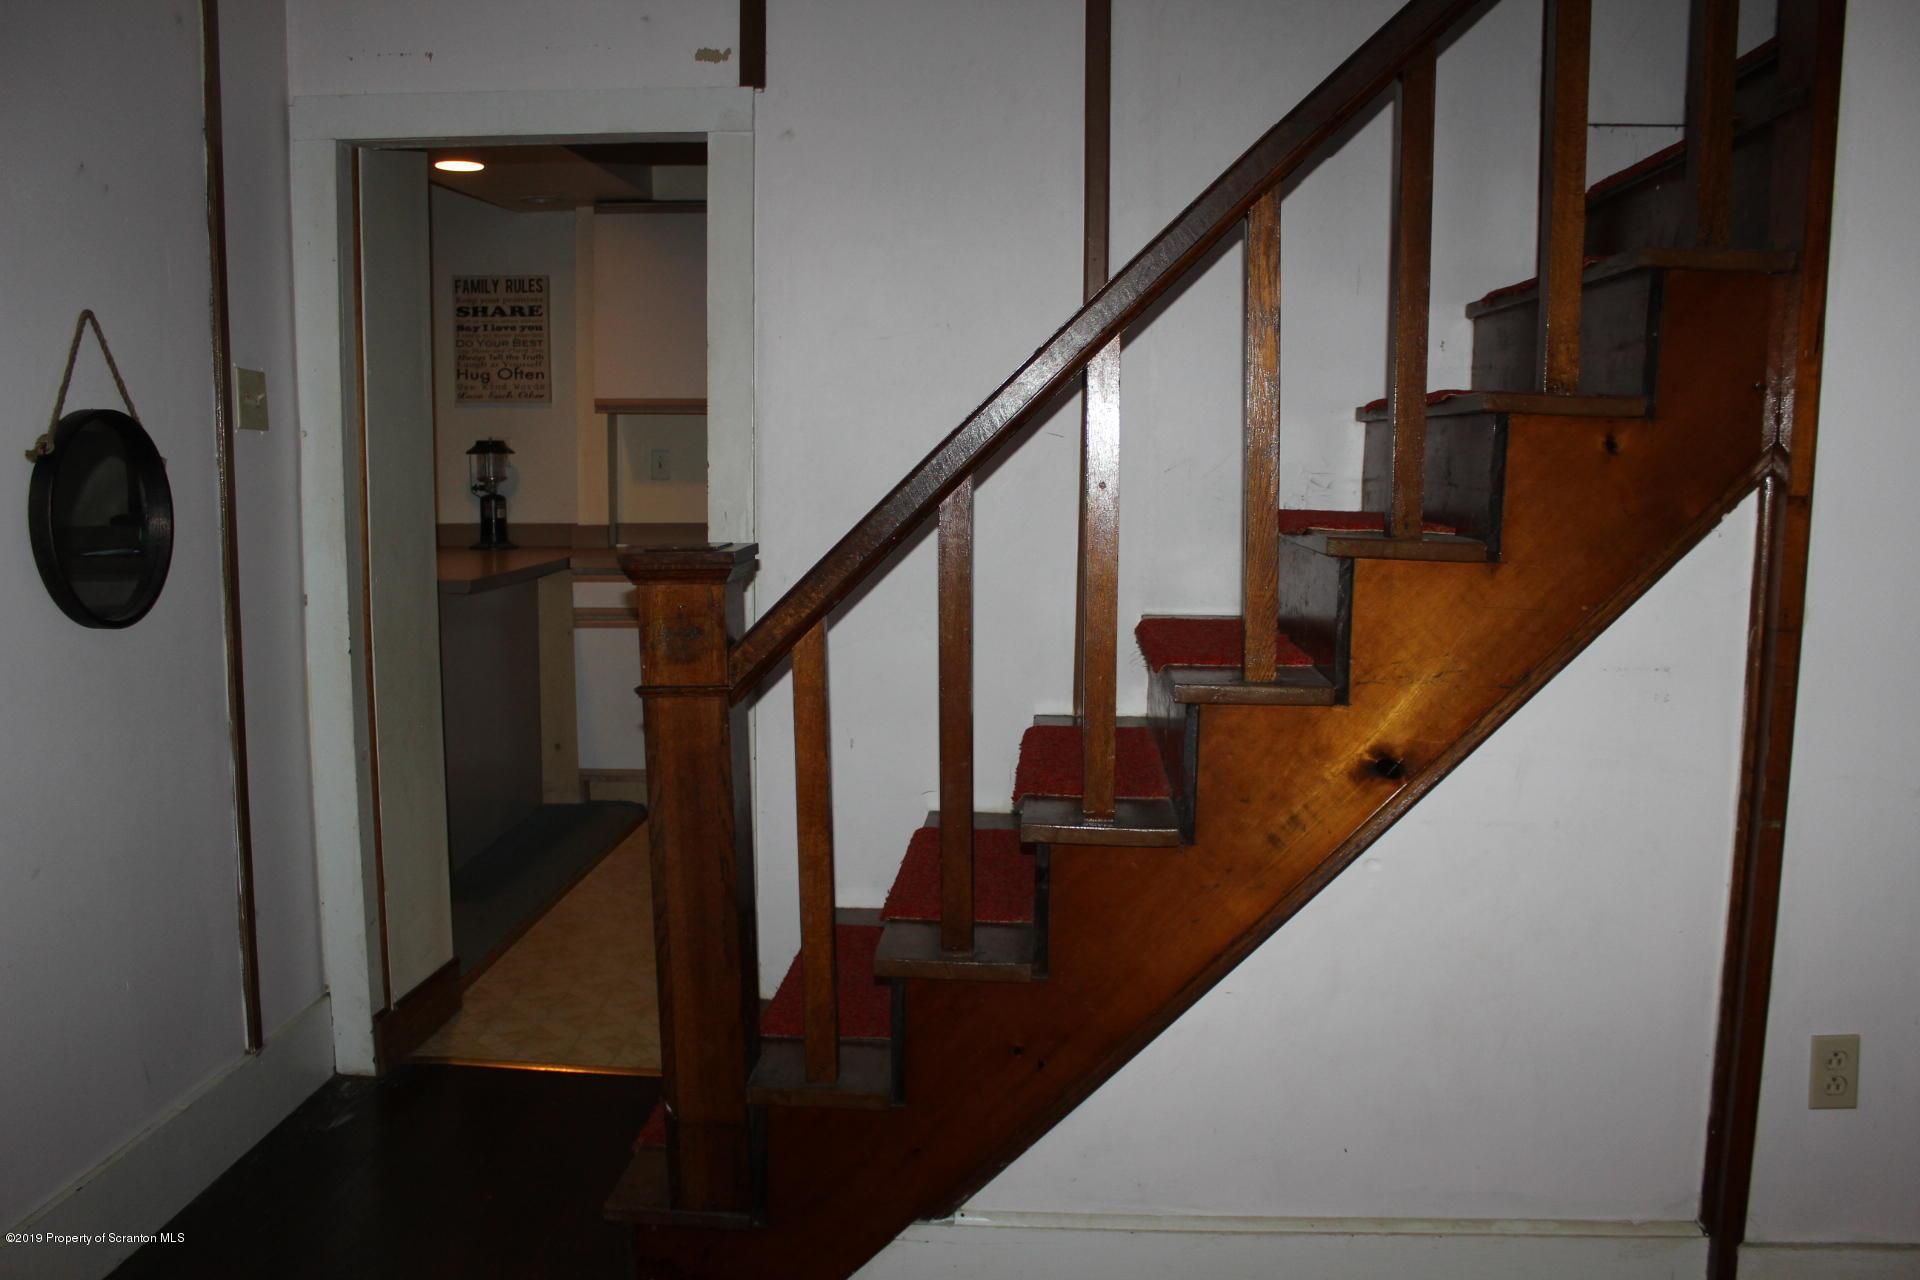 79 Baylors Lake Road, Nicholson, Pennsylvania 18446, 3 Bedrooms Bedrooms, 7 Rooms Rooms,2 BathroomsBathrooms,Single Family,For Sale,Baylors Lake,19-4381